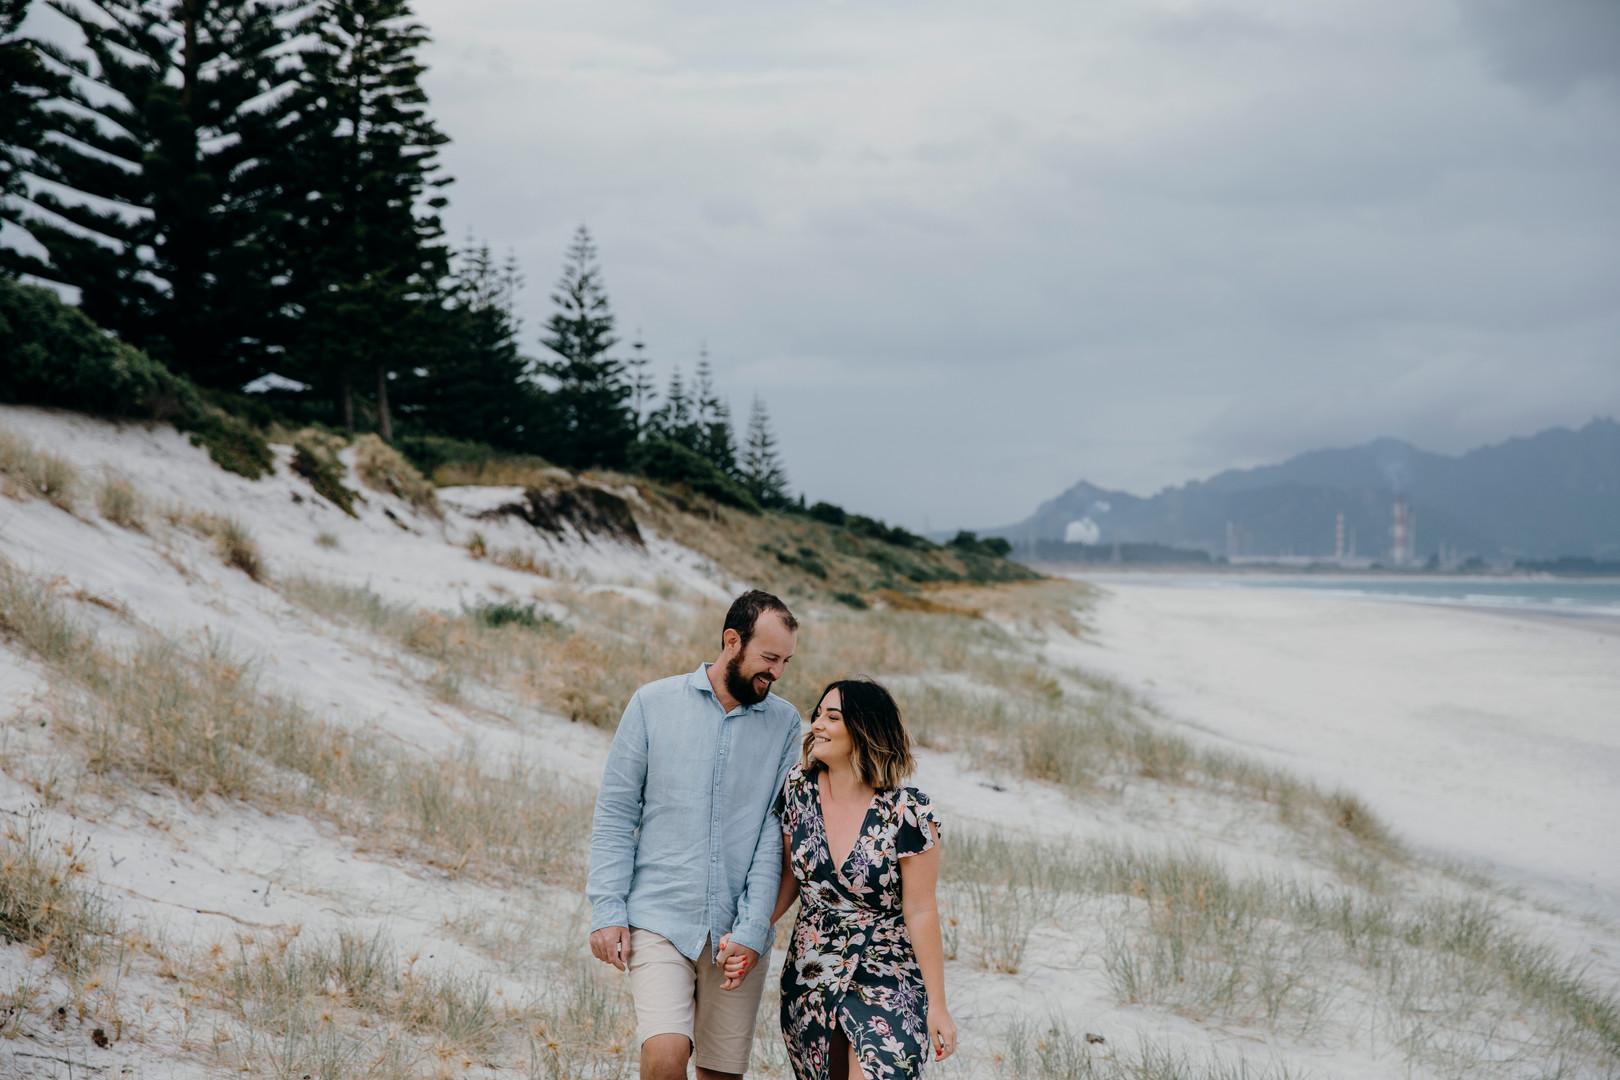 Hamilton Photographer | Haley Adele Photographer